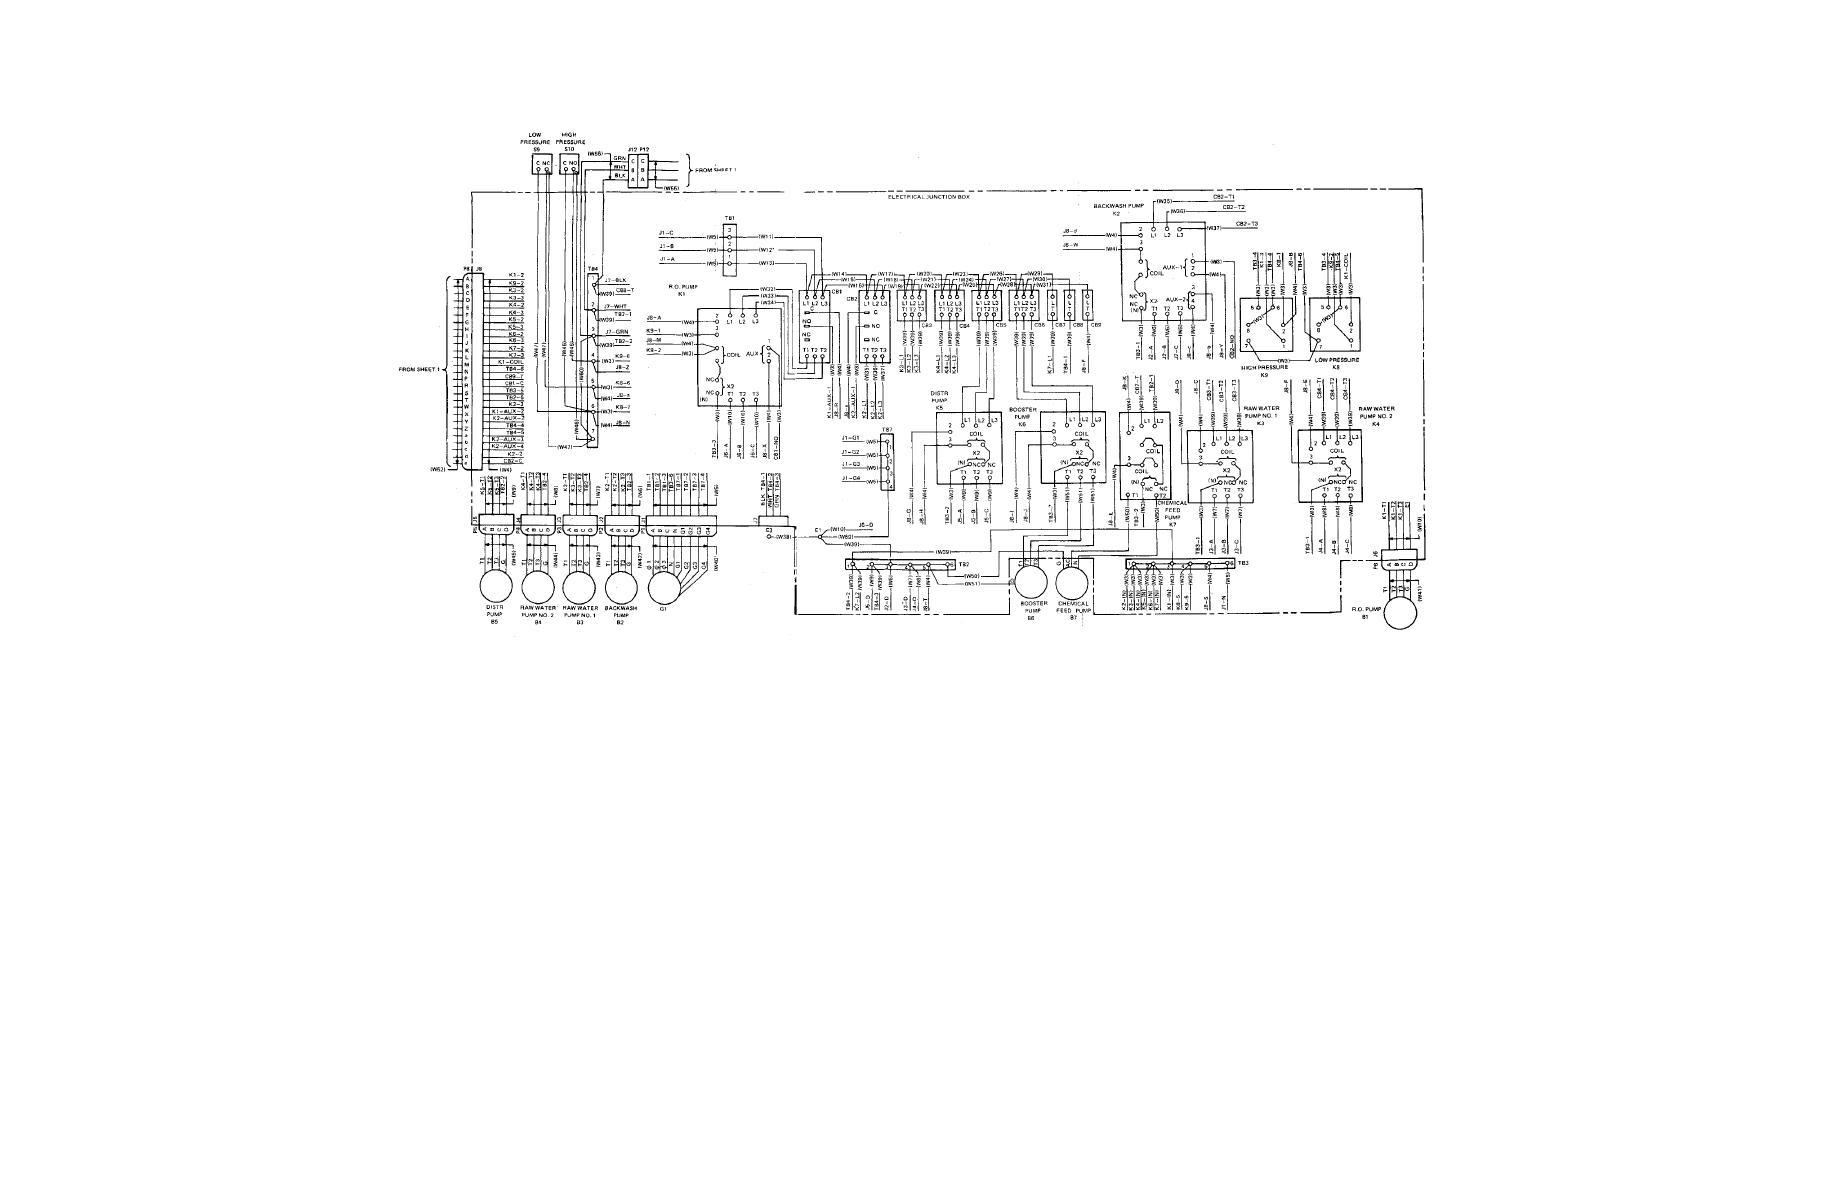 Fo 4 Interconnection Diagram Rowpu Sheet 2 Of 3